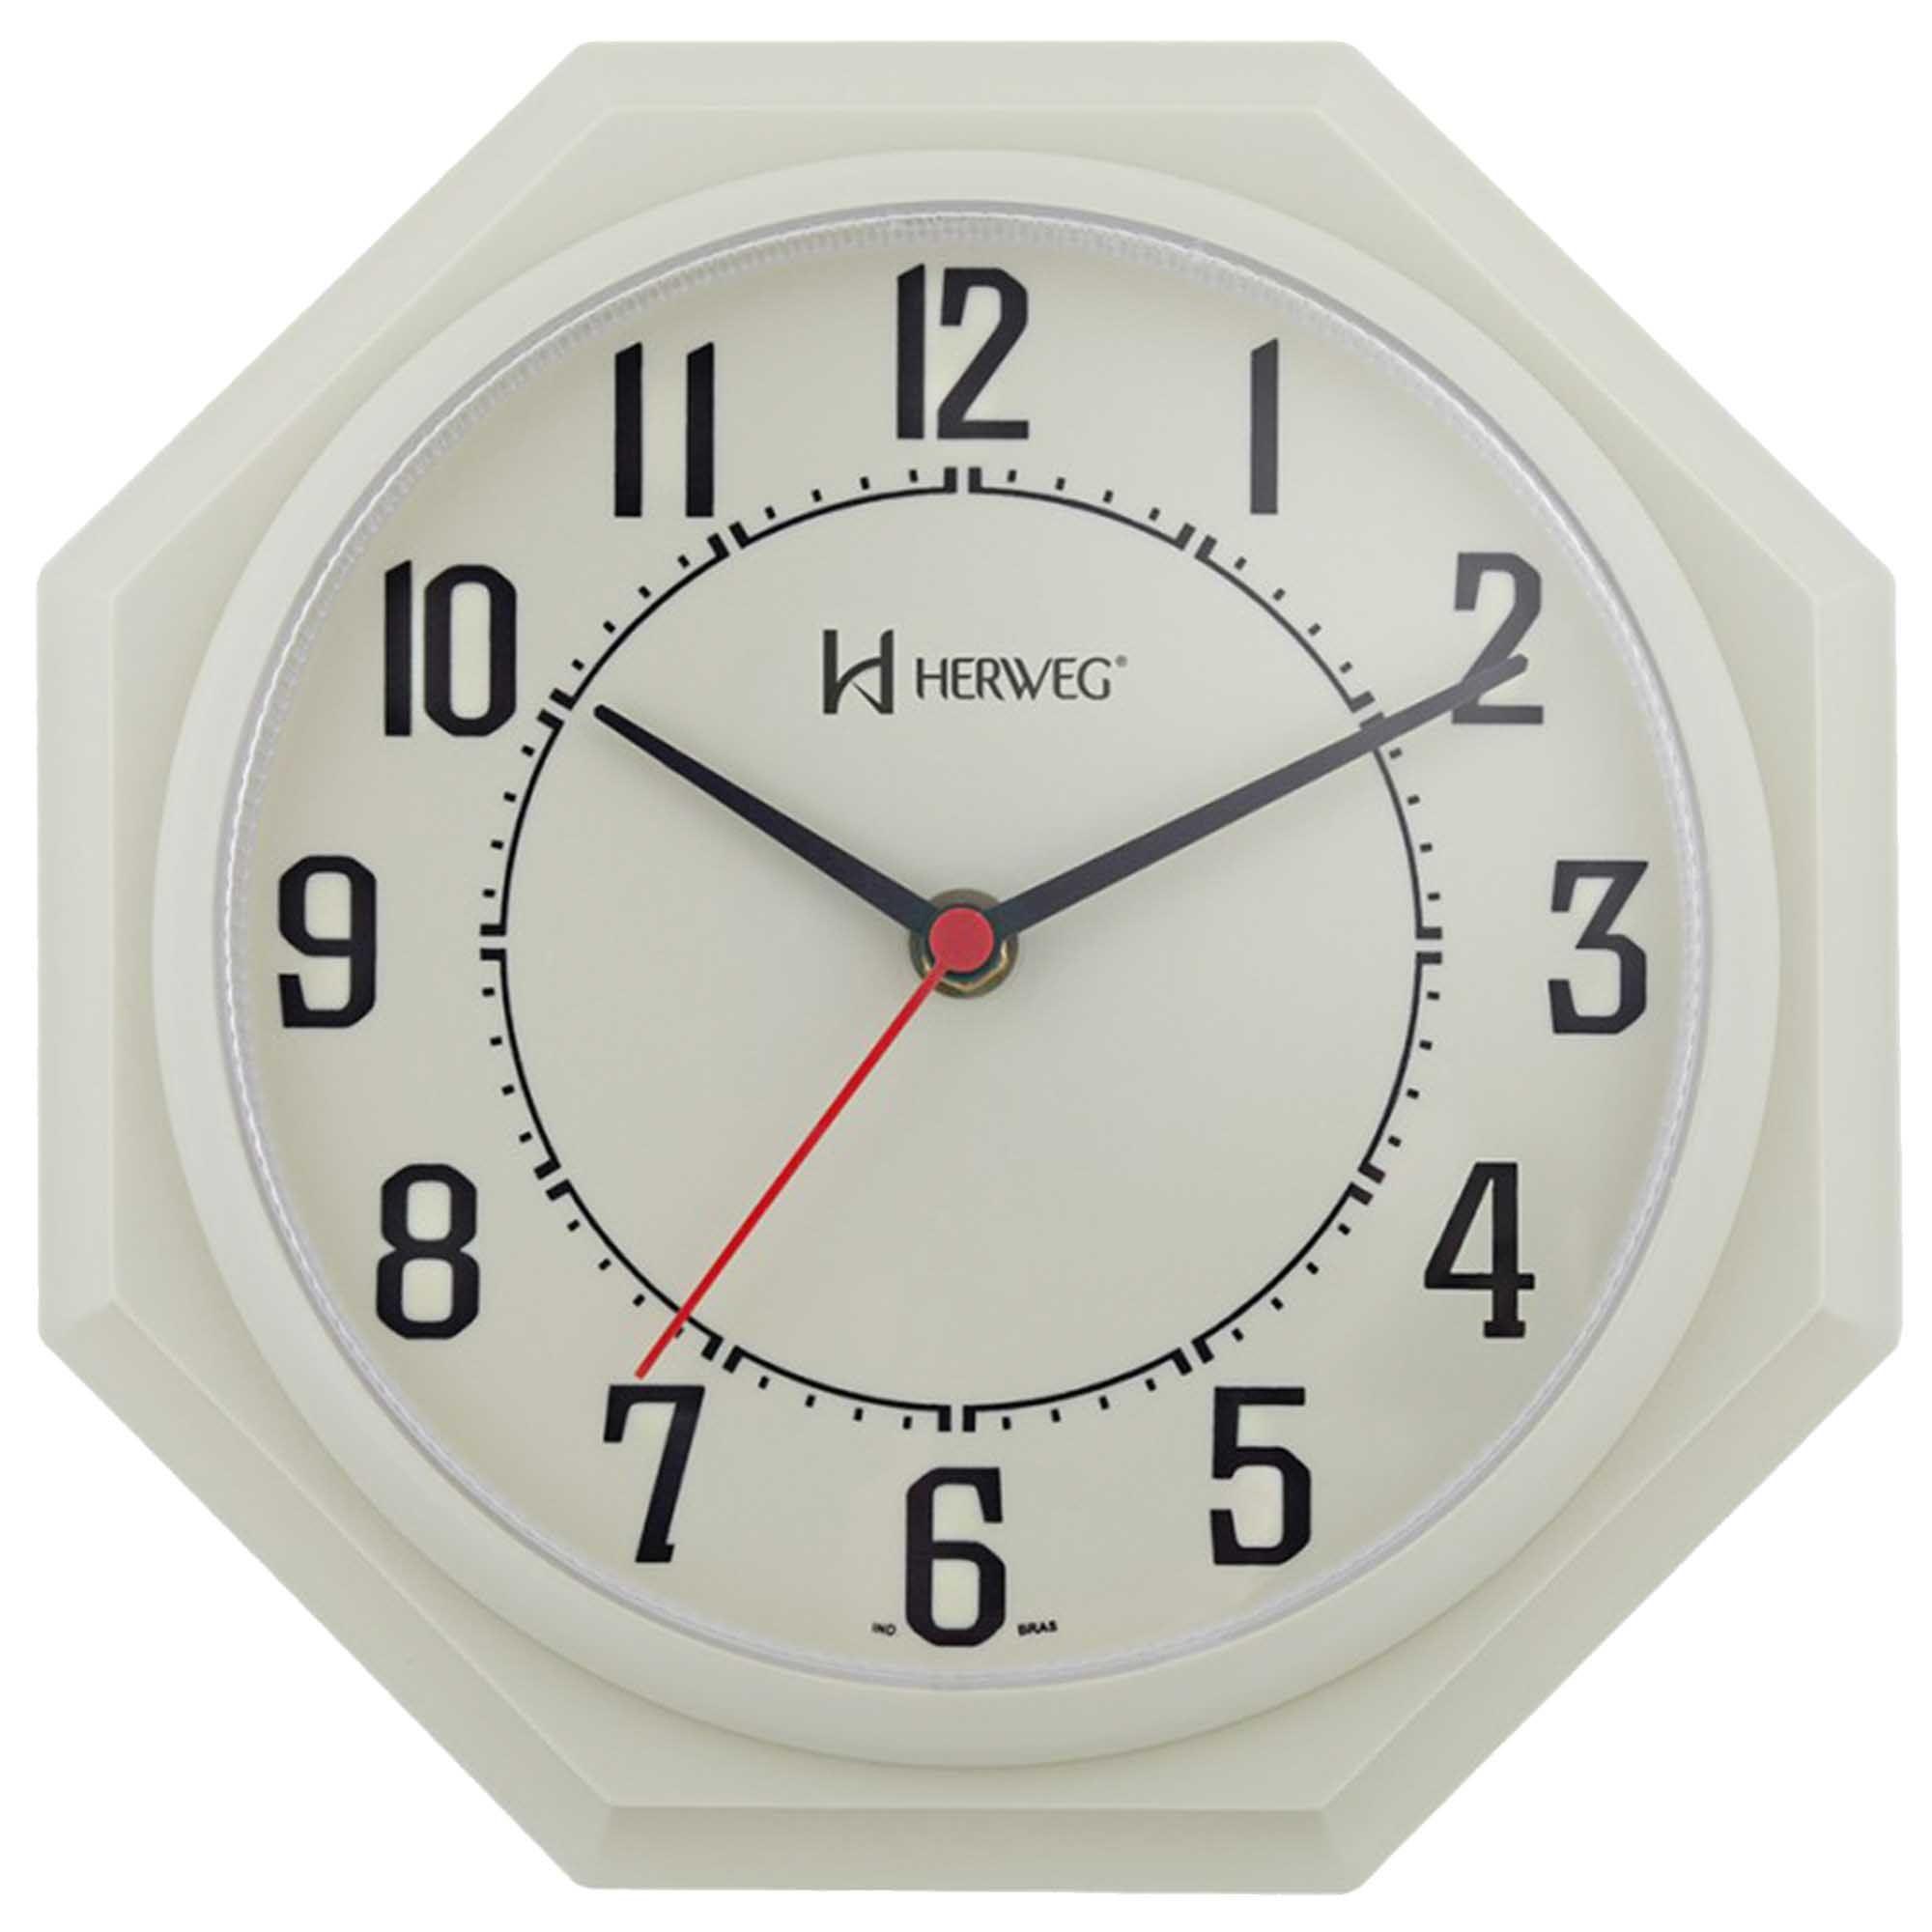 Relógio de Parede Analógico Herweg 6117 032 Marfim